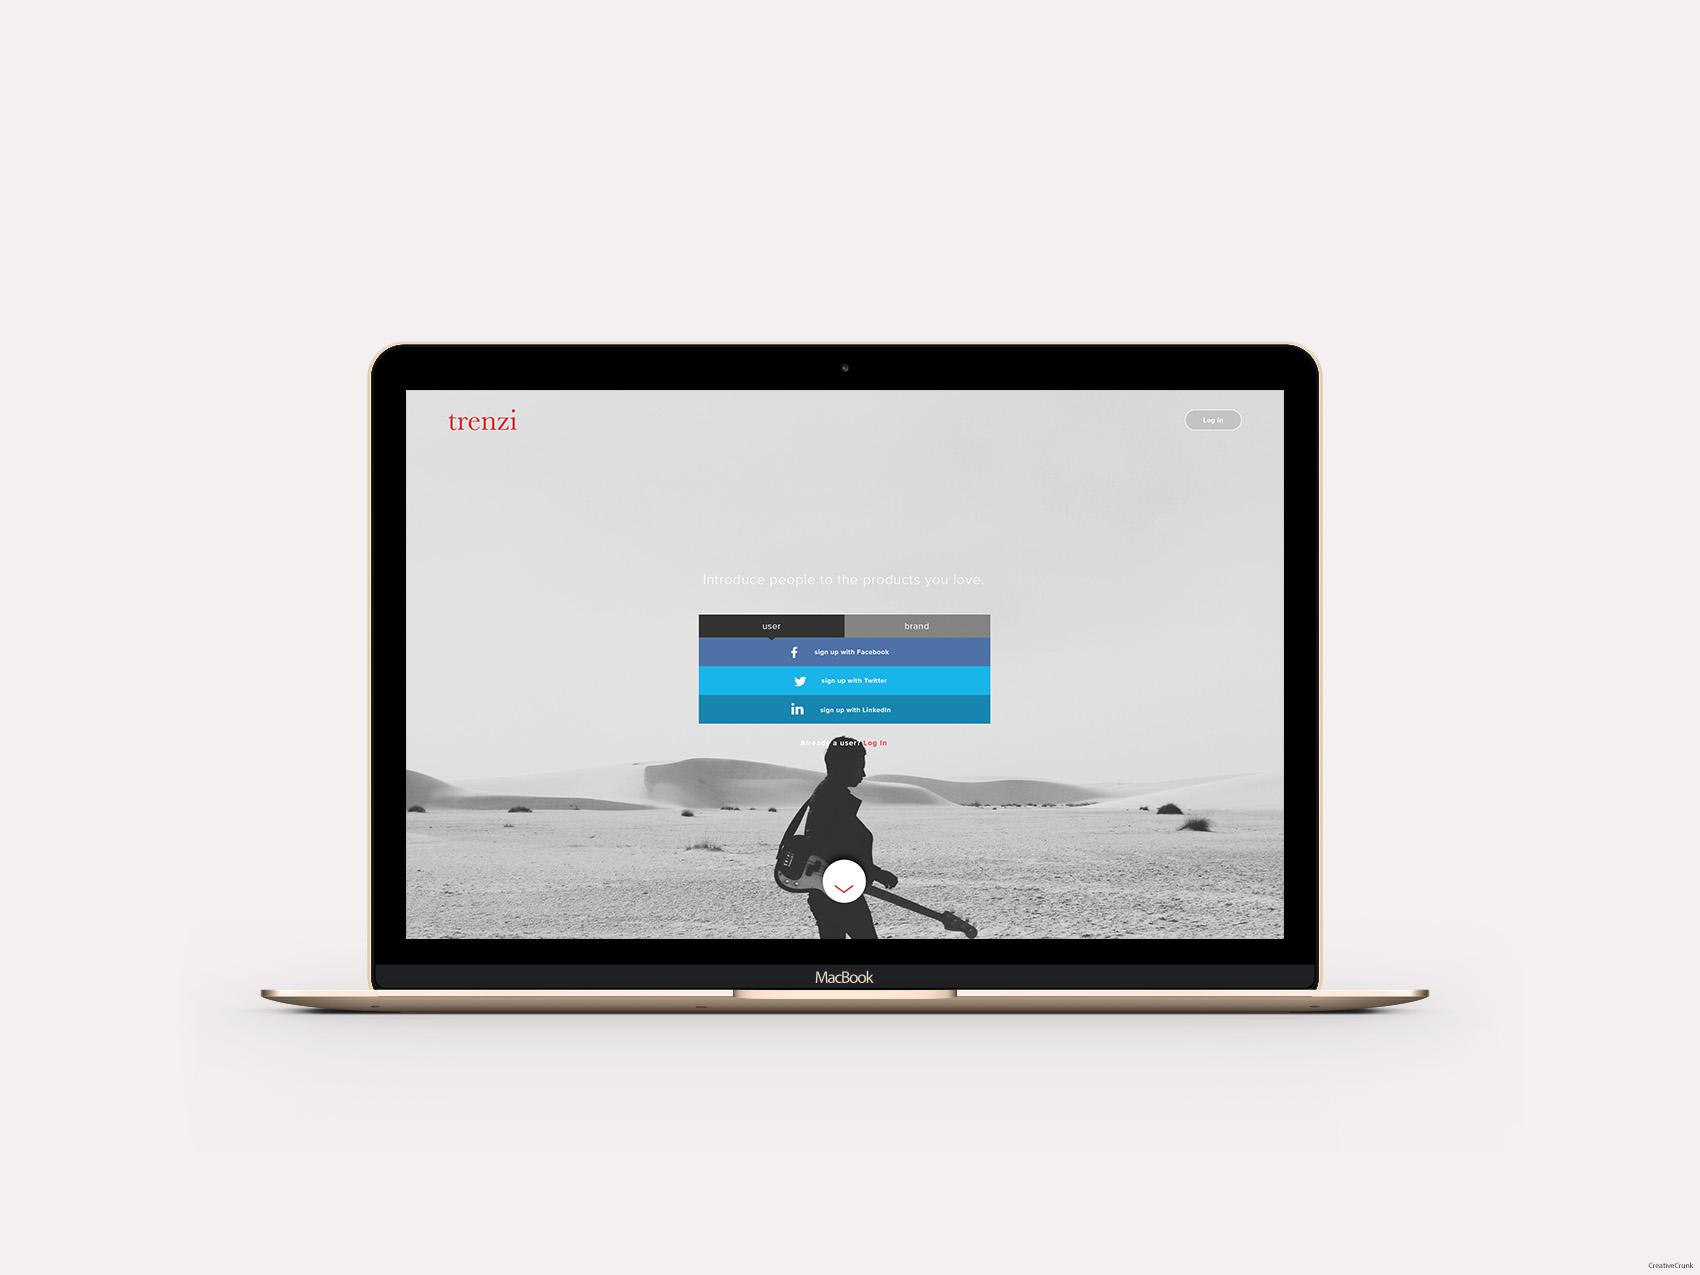 Trenzi - Brand Influencer platform